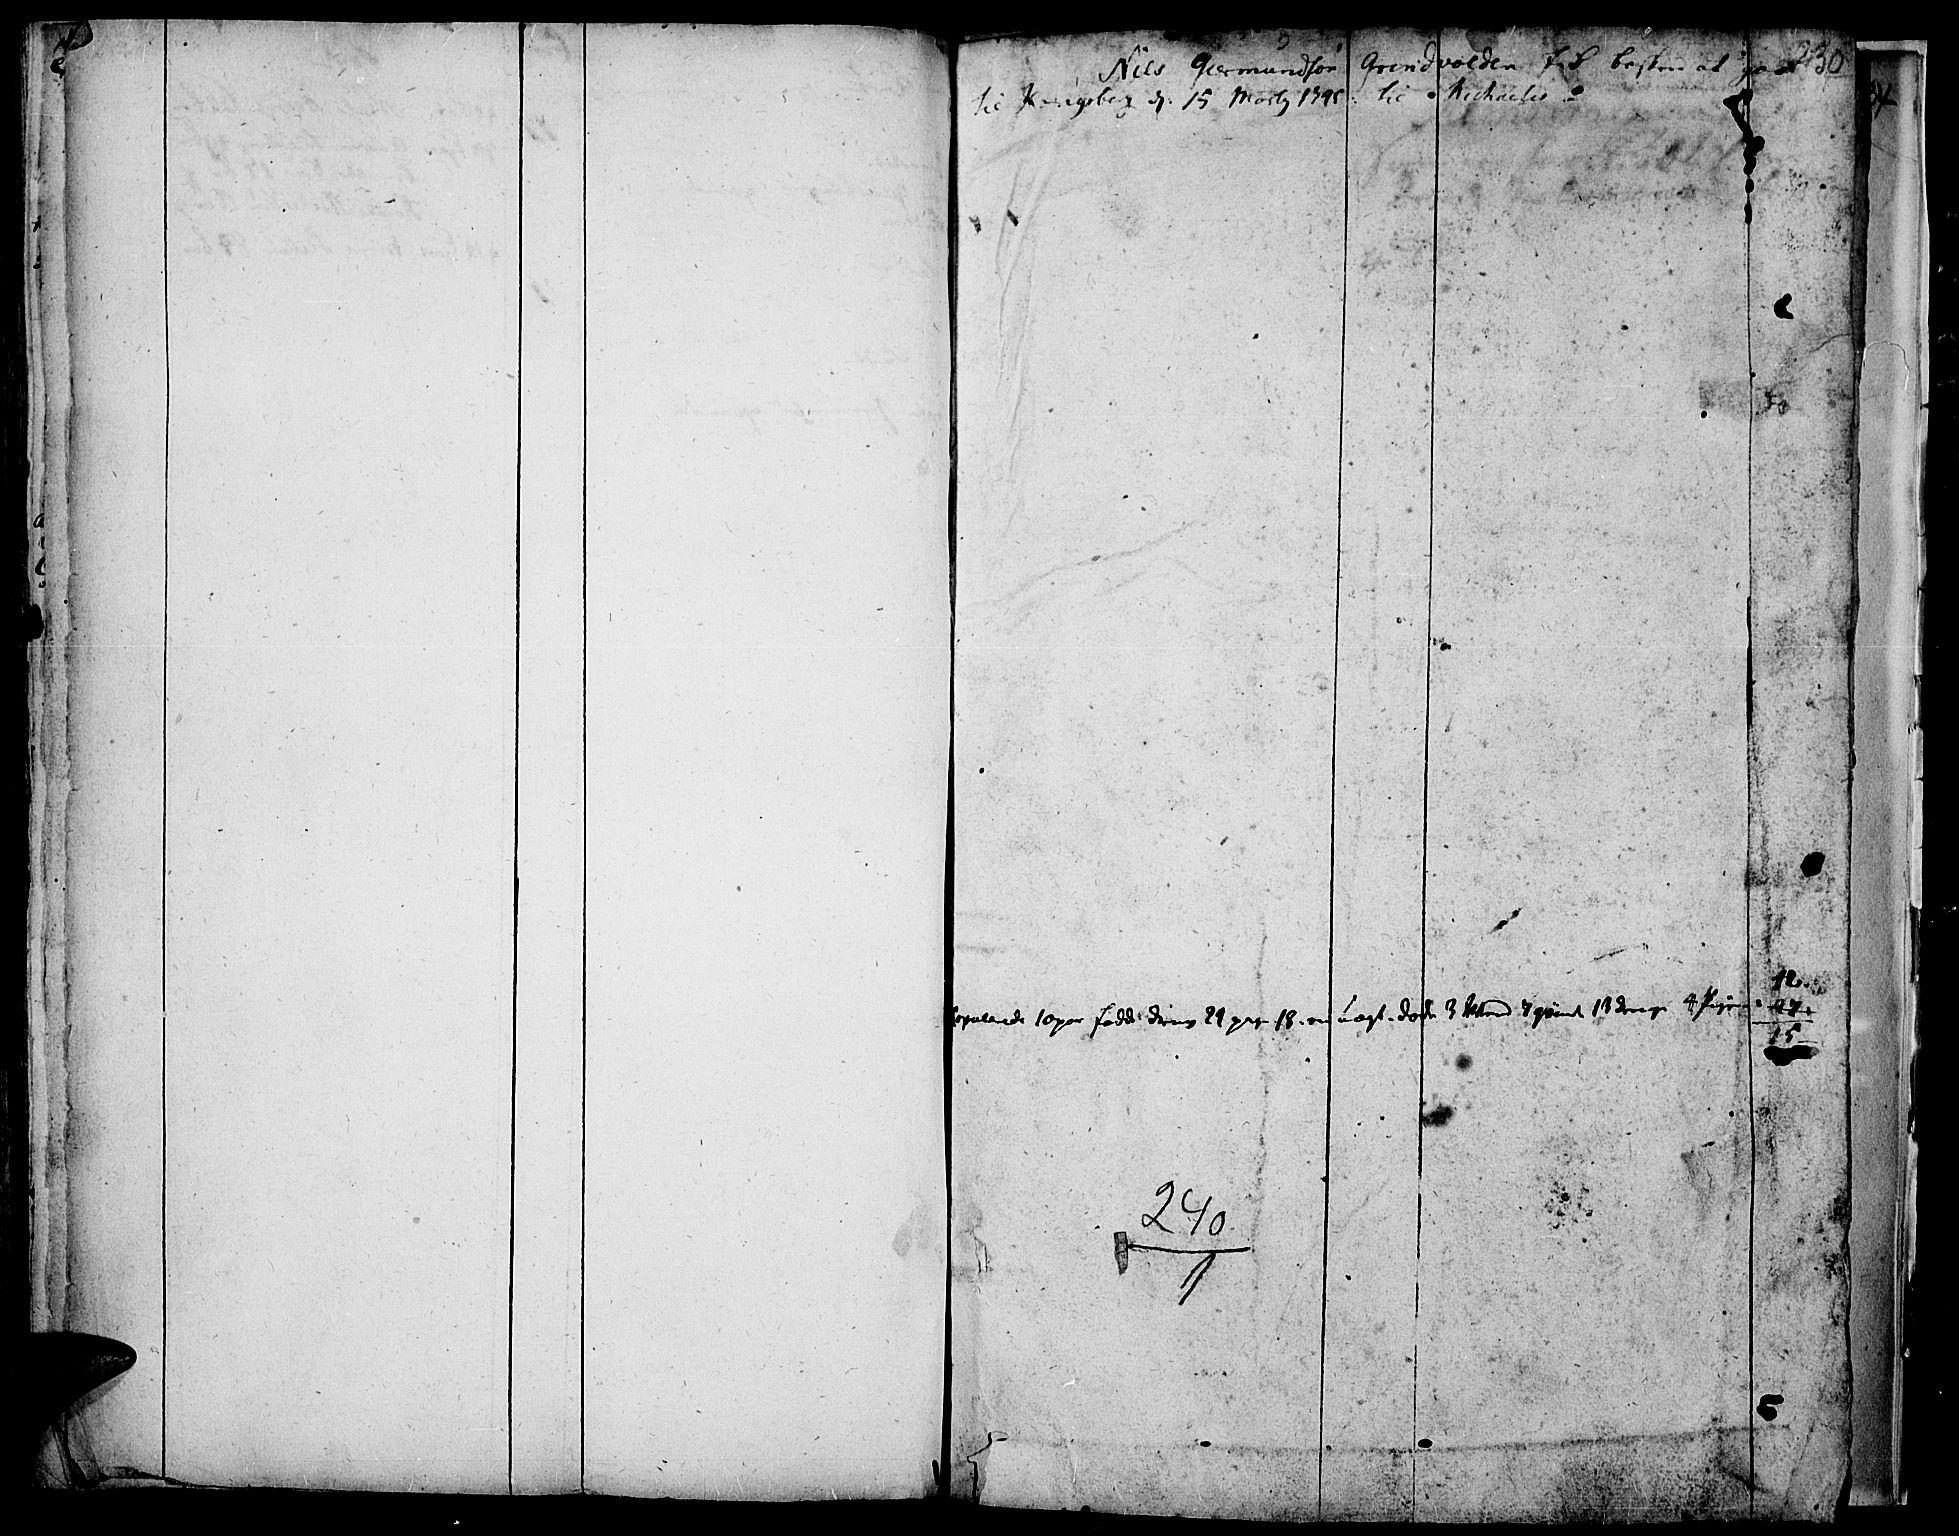 SAH, Vardal prestekontor, H/Ha/Haa/L0001: Ministerialbok nr. 1, 1706-1748, s. 230